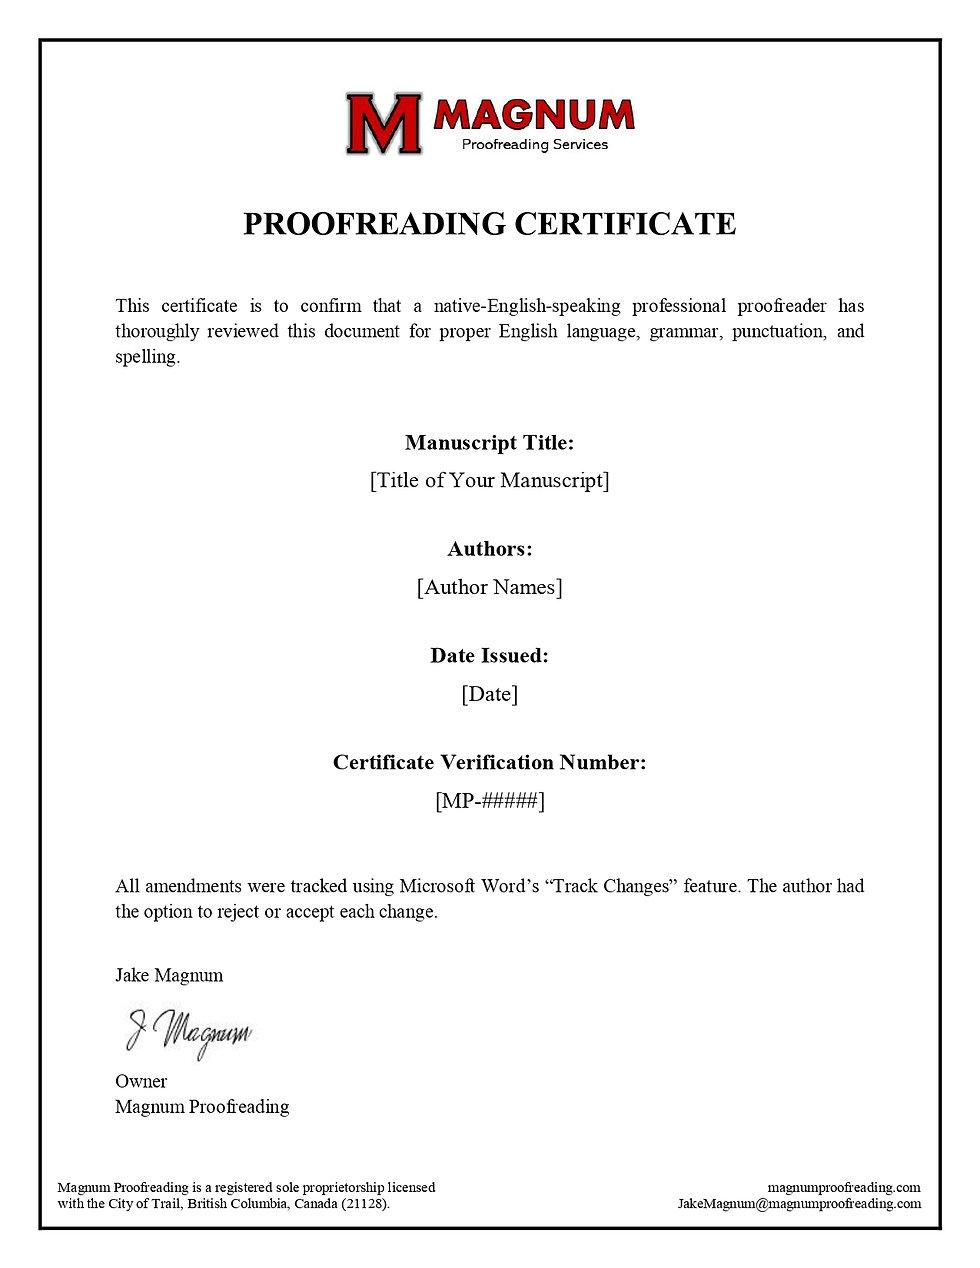 Blank Certificate - Economic.jpg